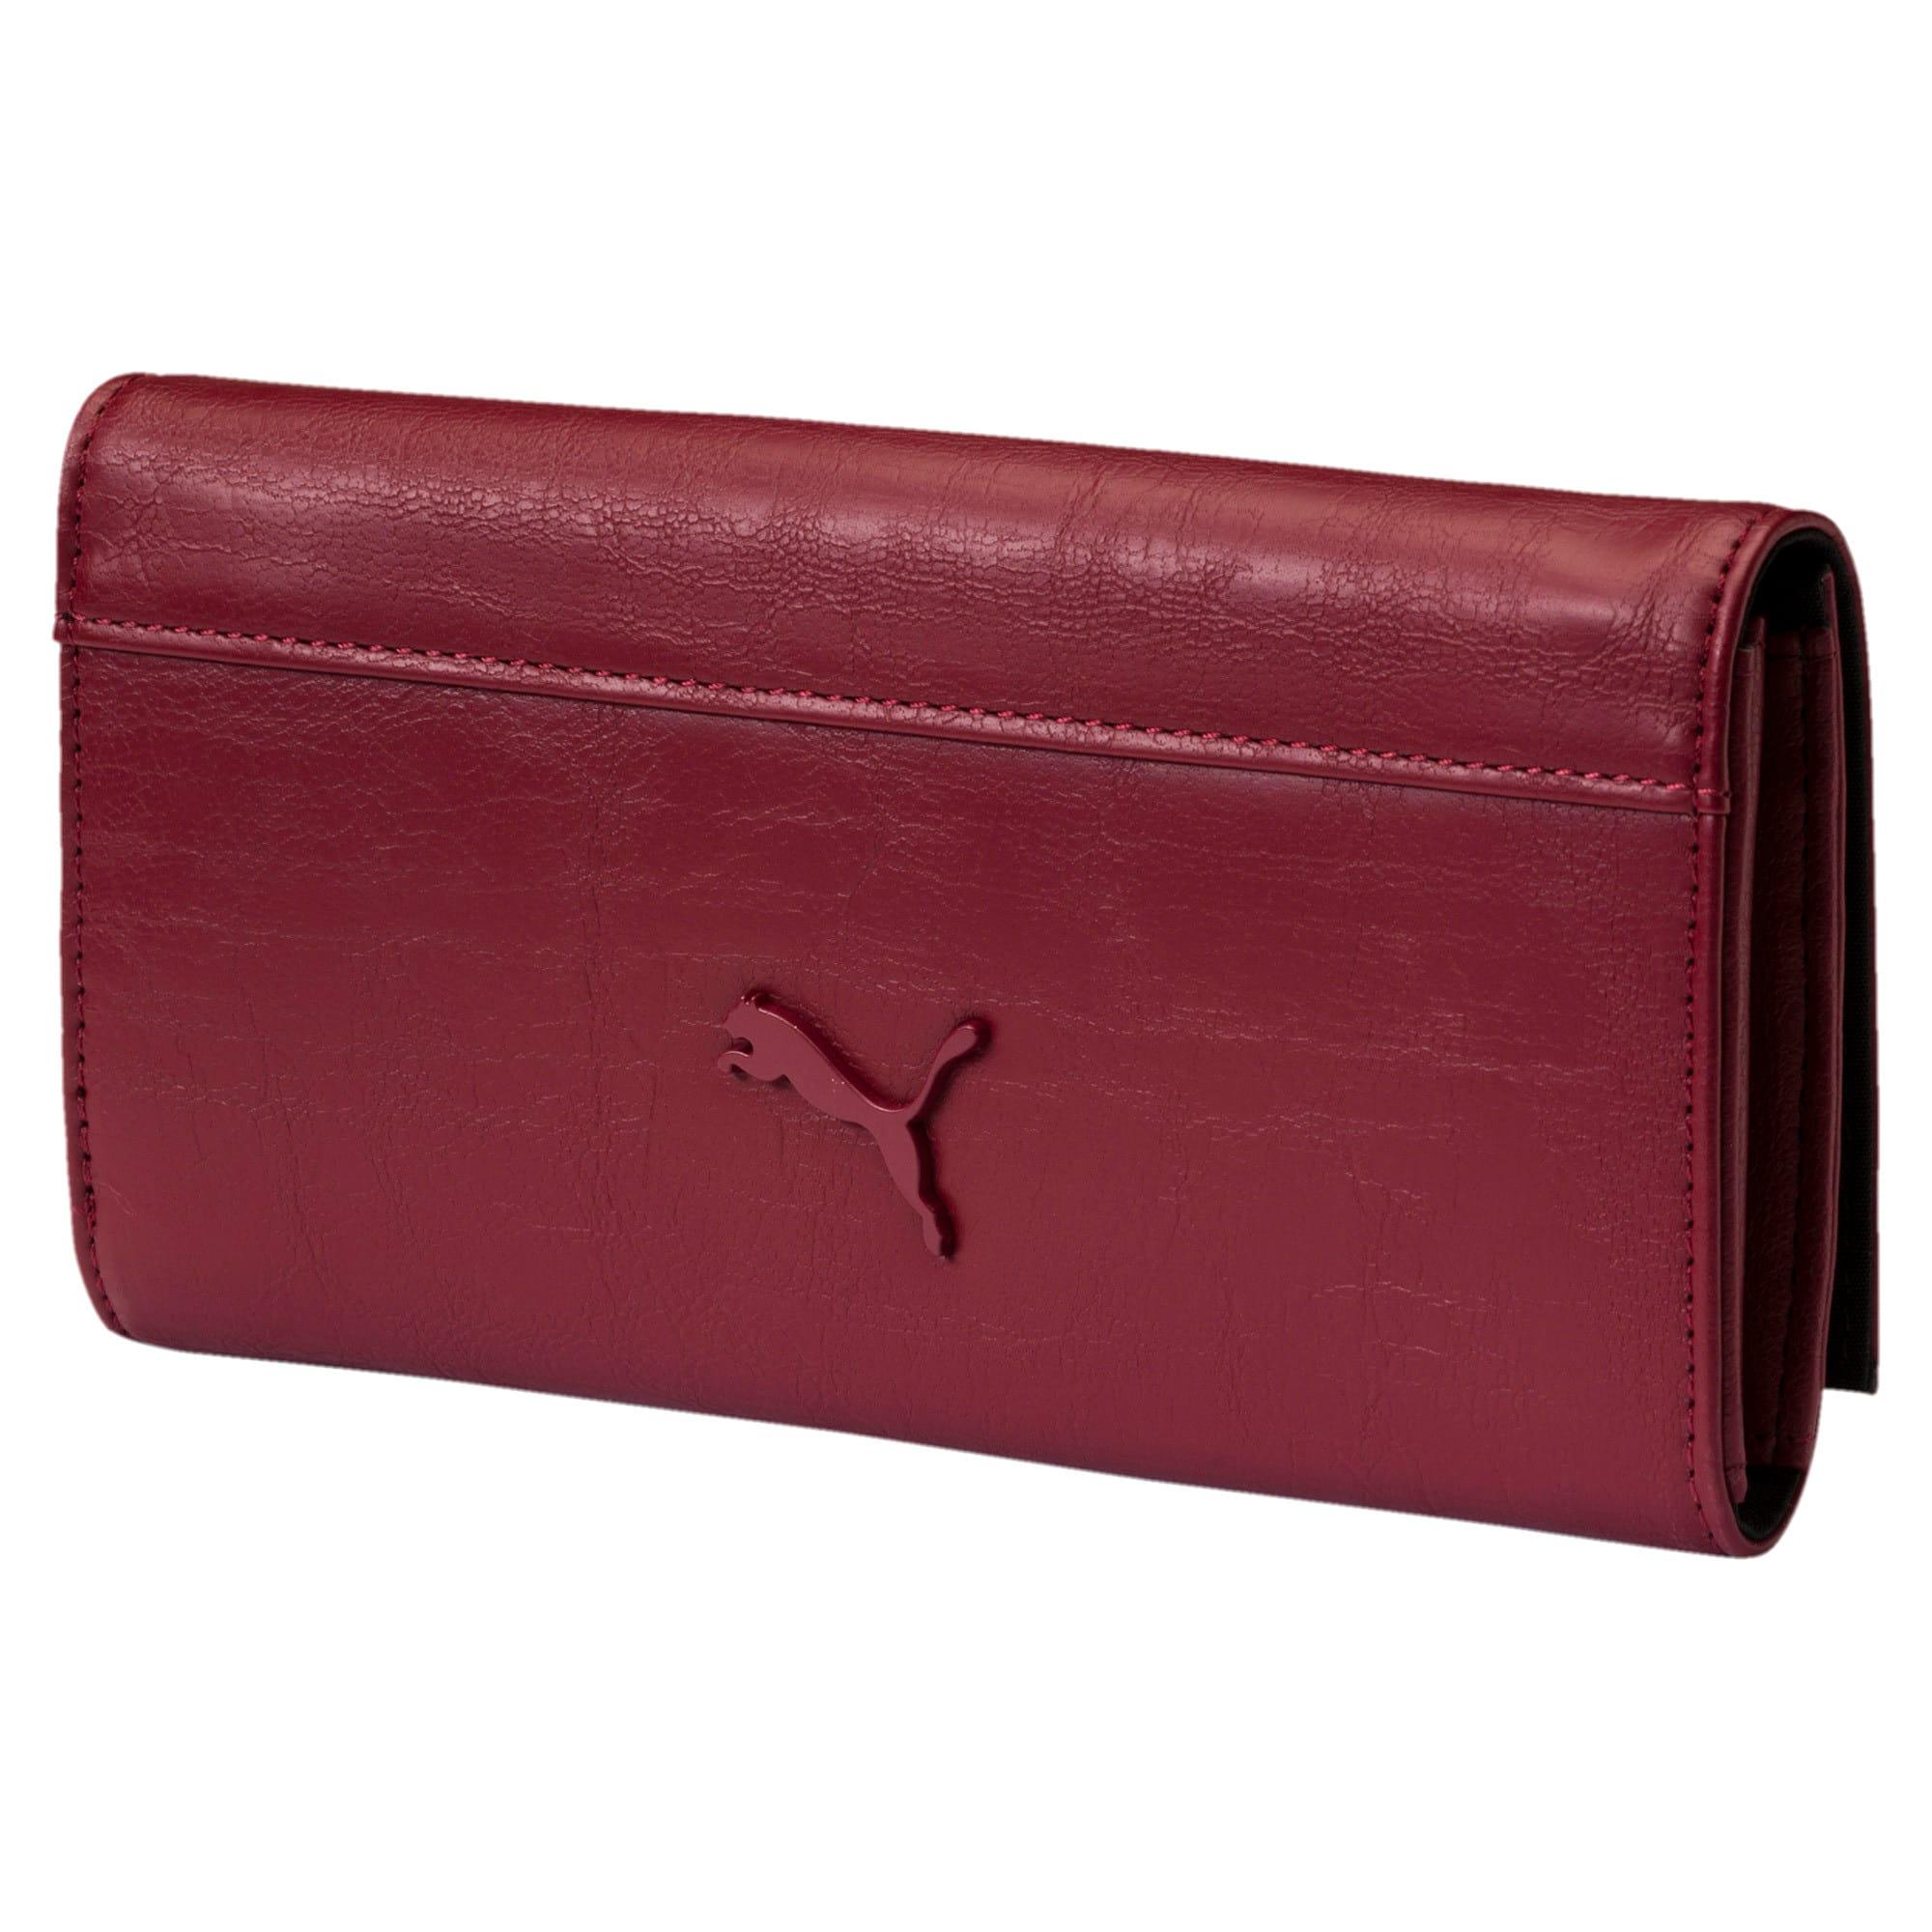 Thumbnail 2 of Ferrari Lifestyle Women's Wallet, Pomegranate, medium-SEA